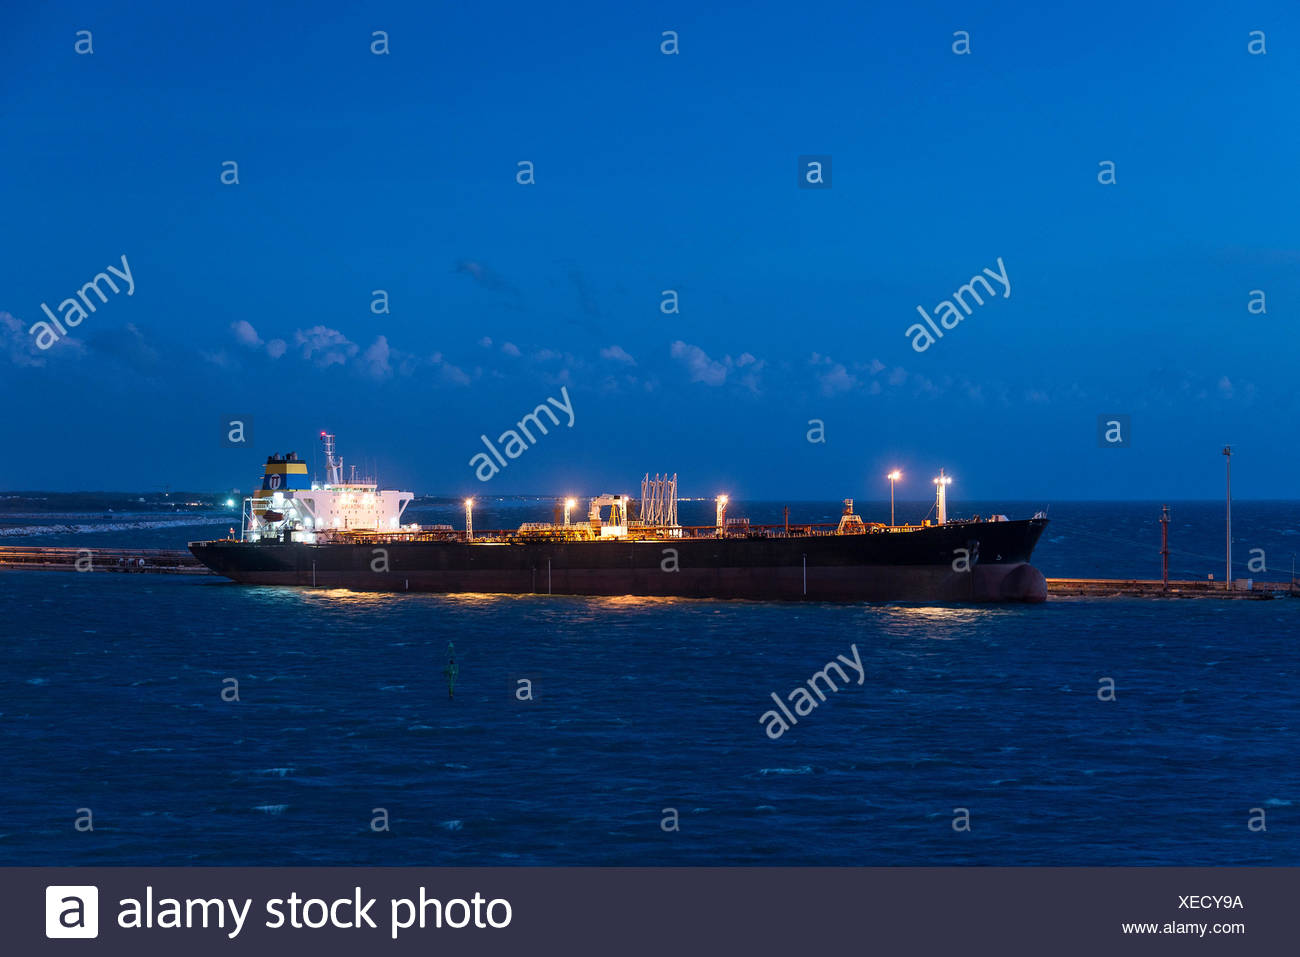 Crude oil tanker ship, Livorno, Italy. - Stock Image